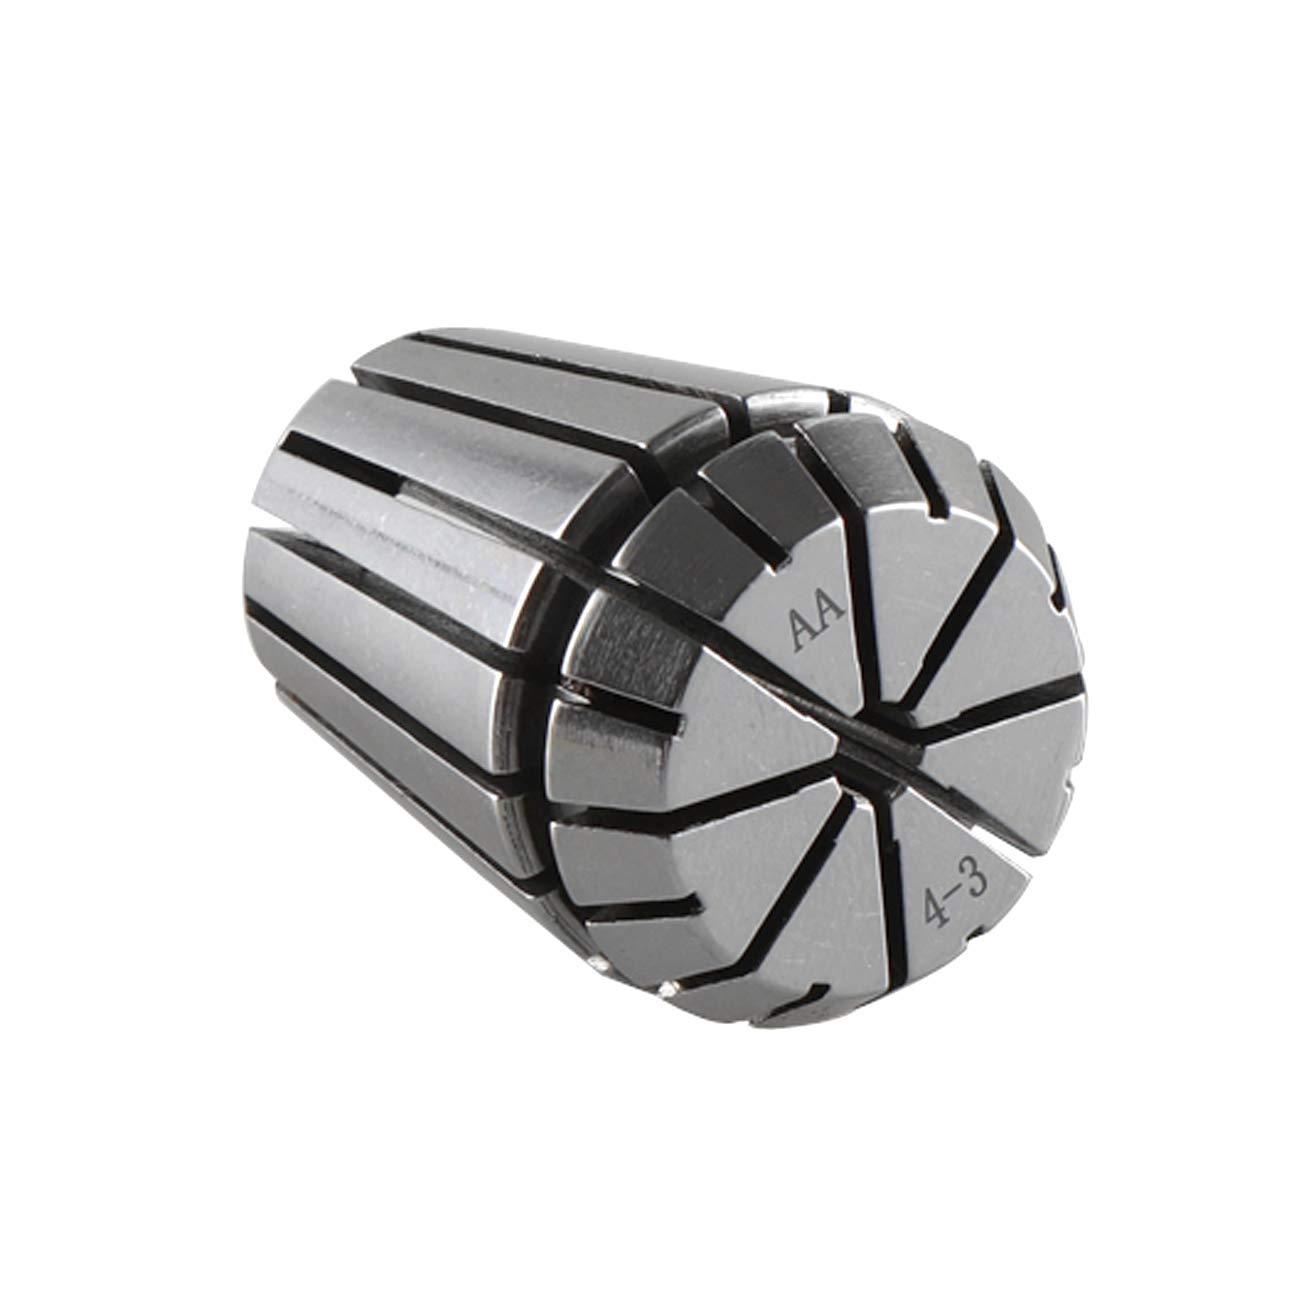 Mingdun 14pcs ER25 3-16mm Metric Spring Collet Set Industrial Grade Accurate New